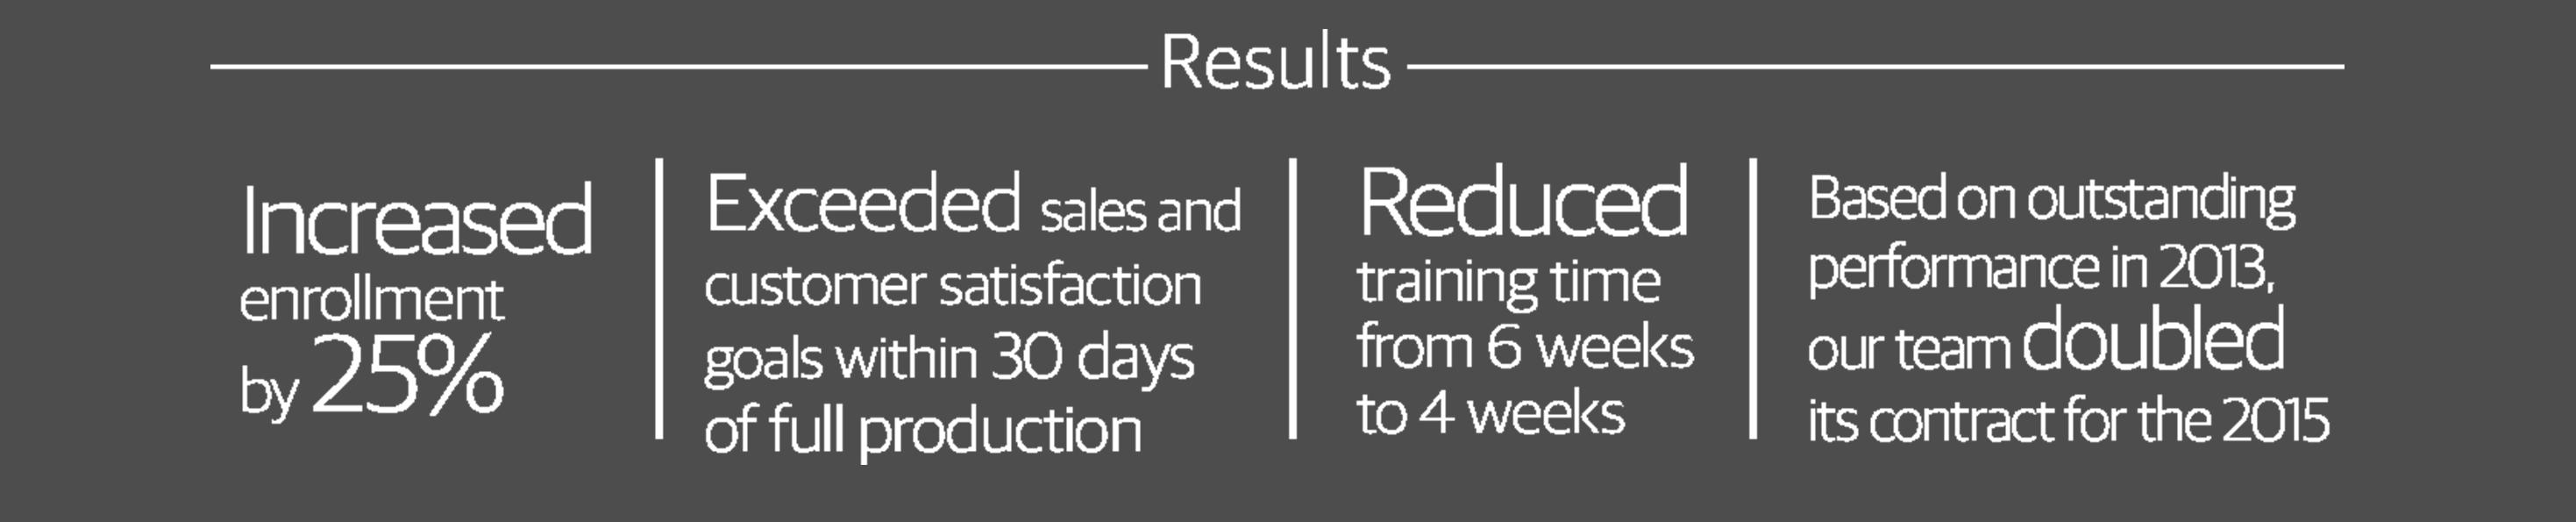 We deployd 500 associates to help our client achieve excellent member satisfaction